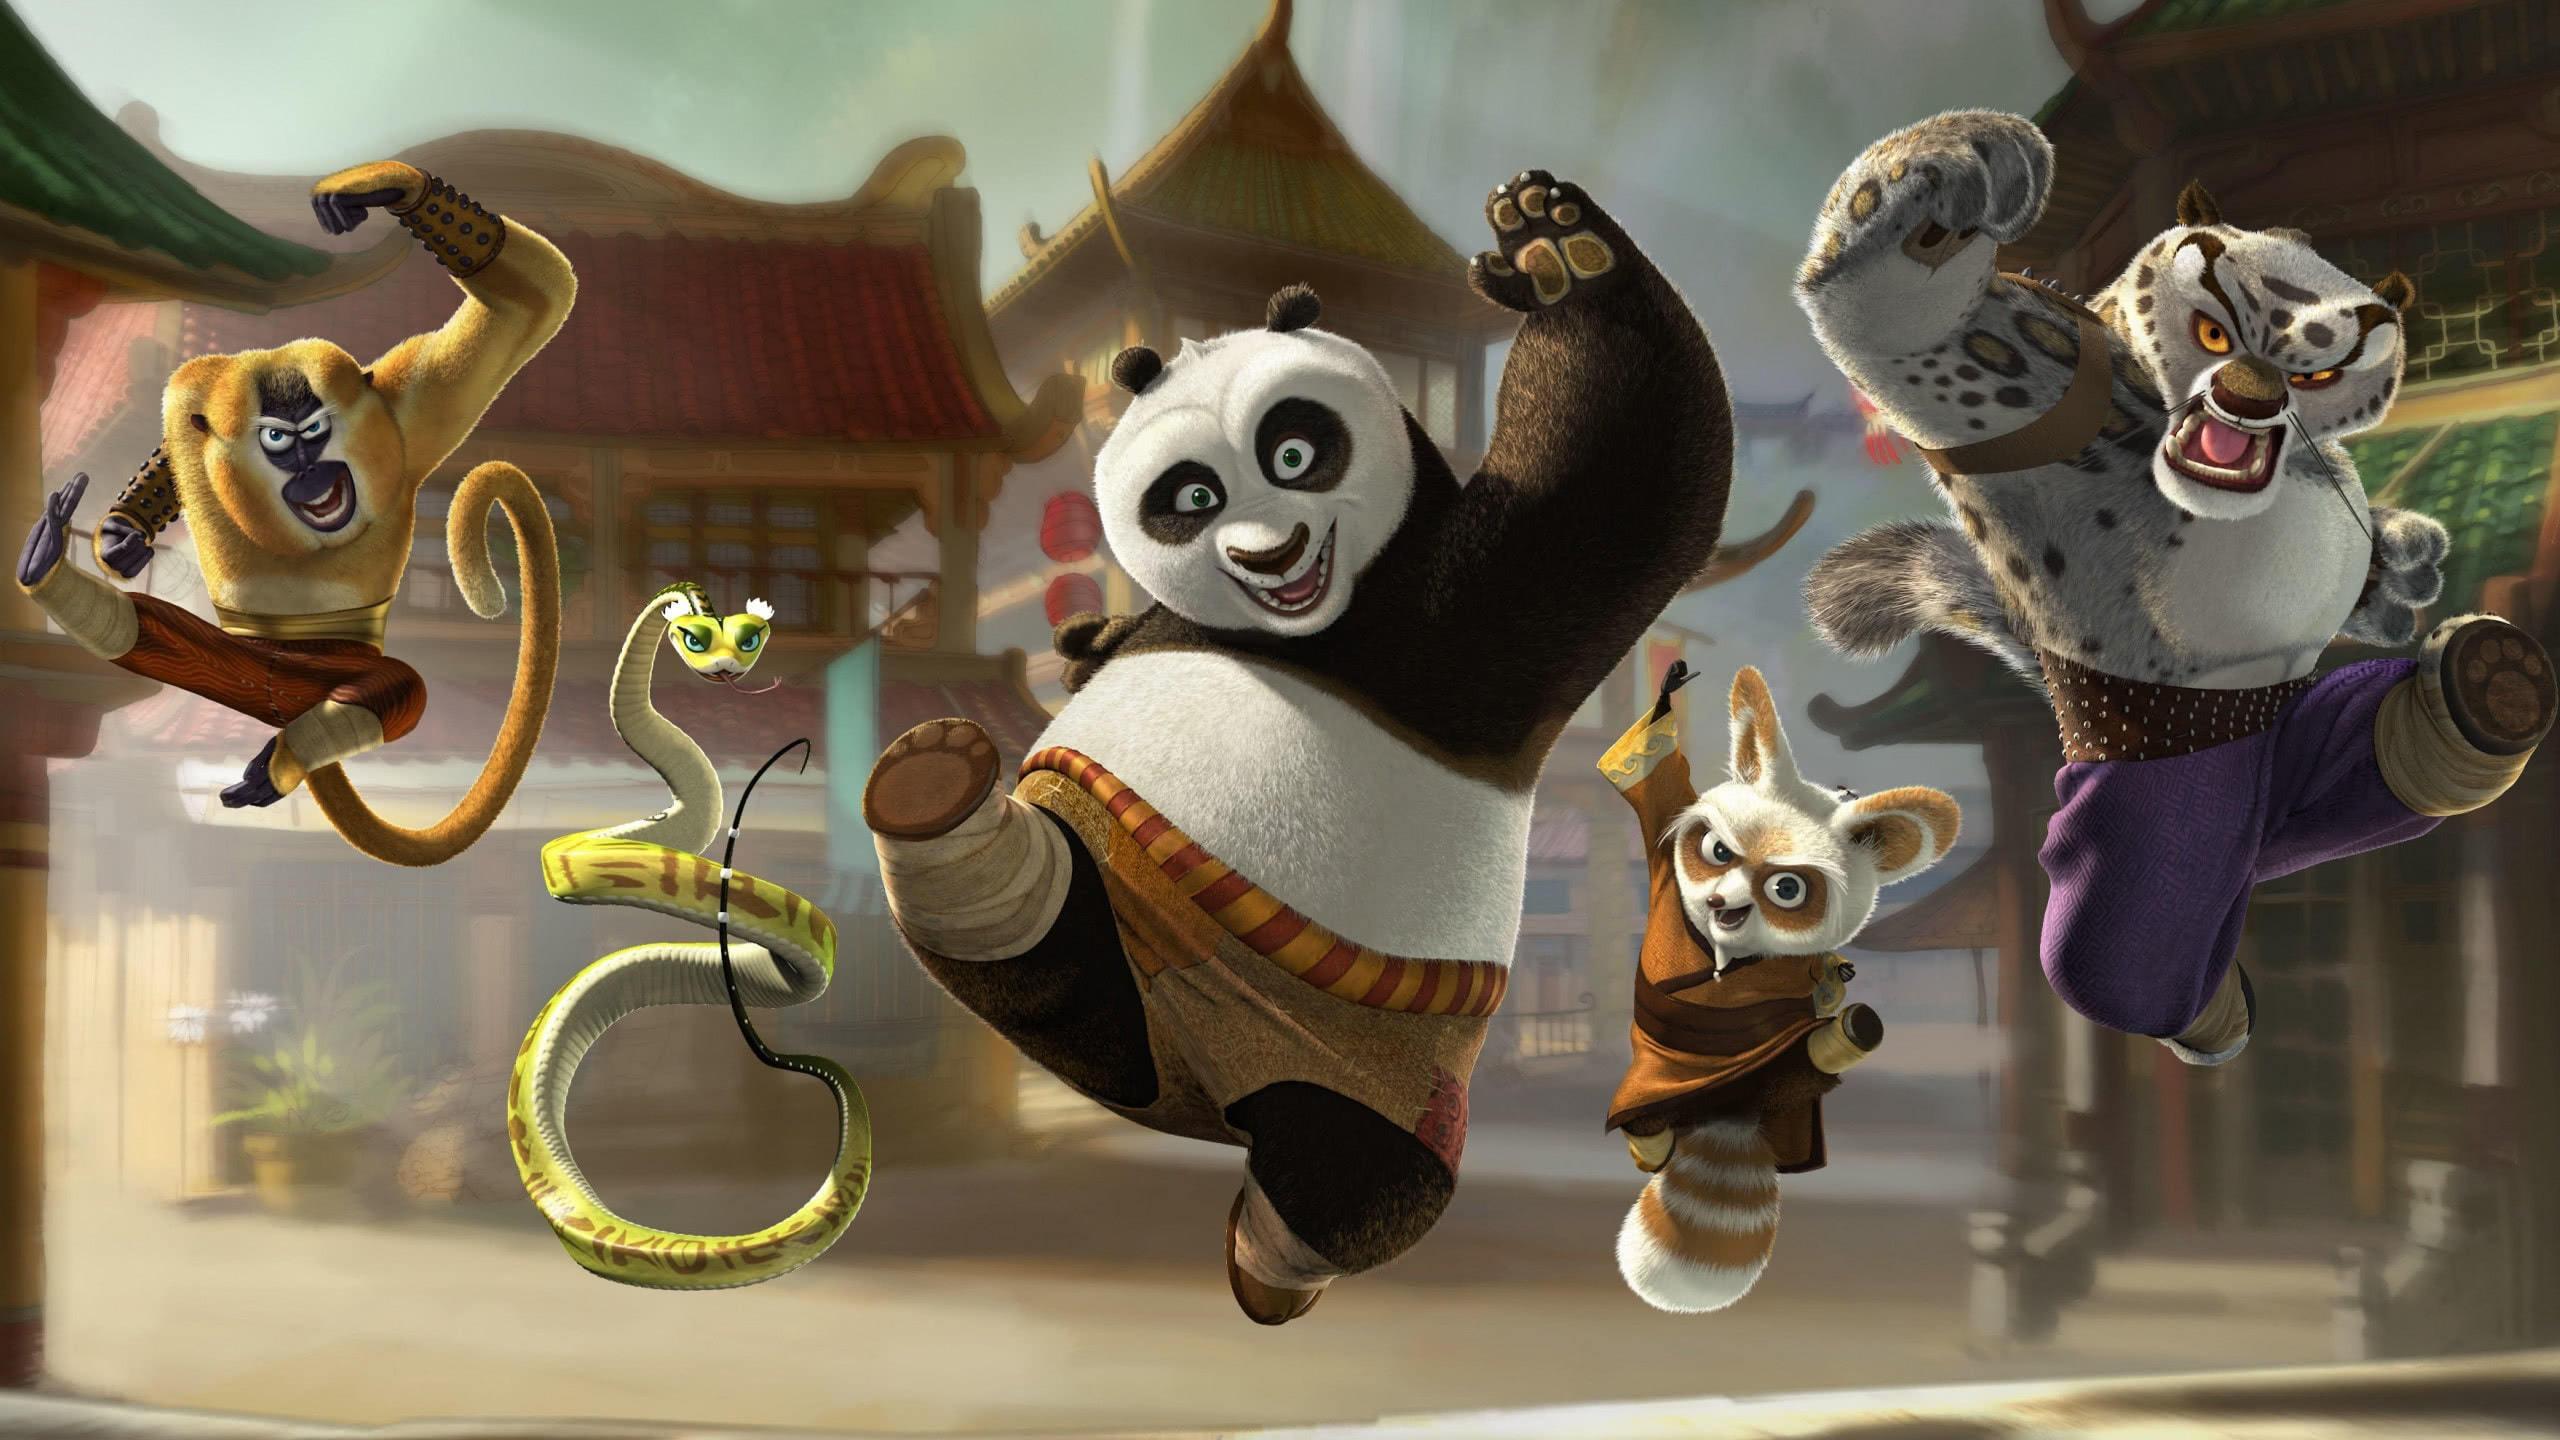 kung fu panda 2 characters wqhd 1440p wallpaper